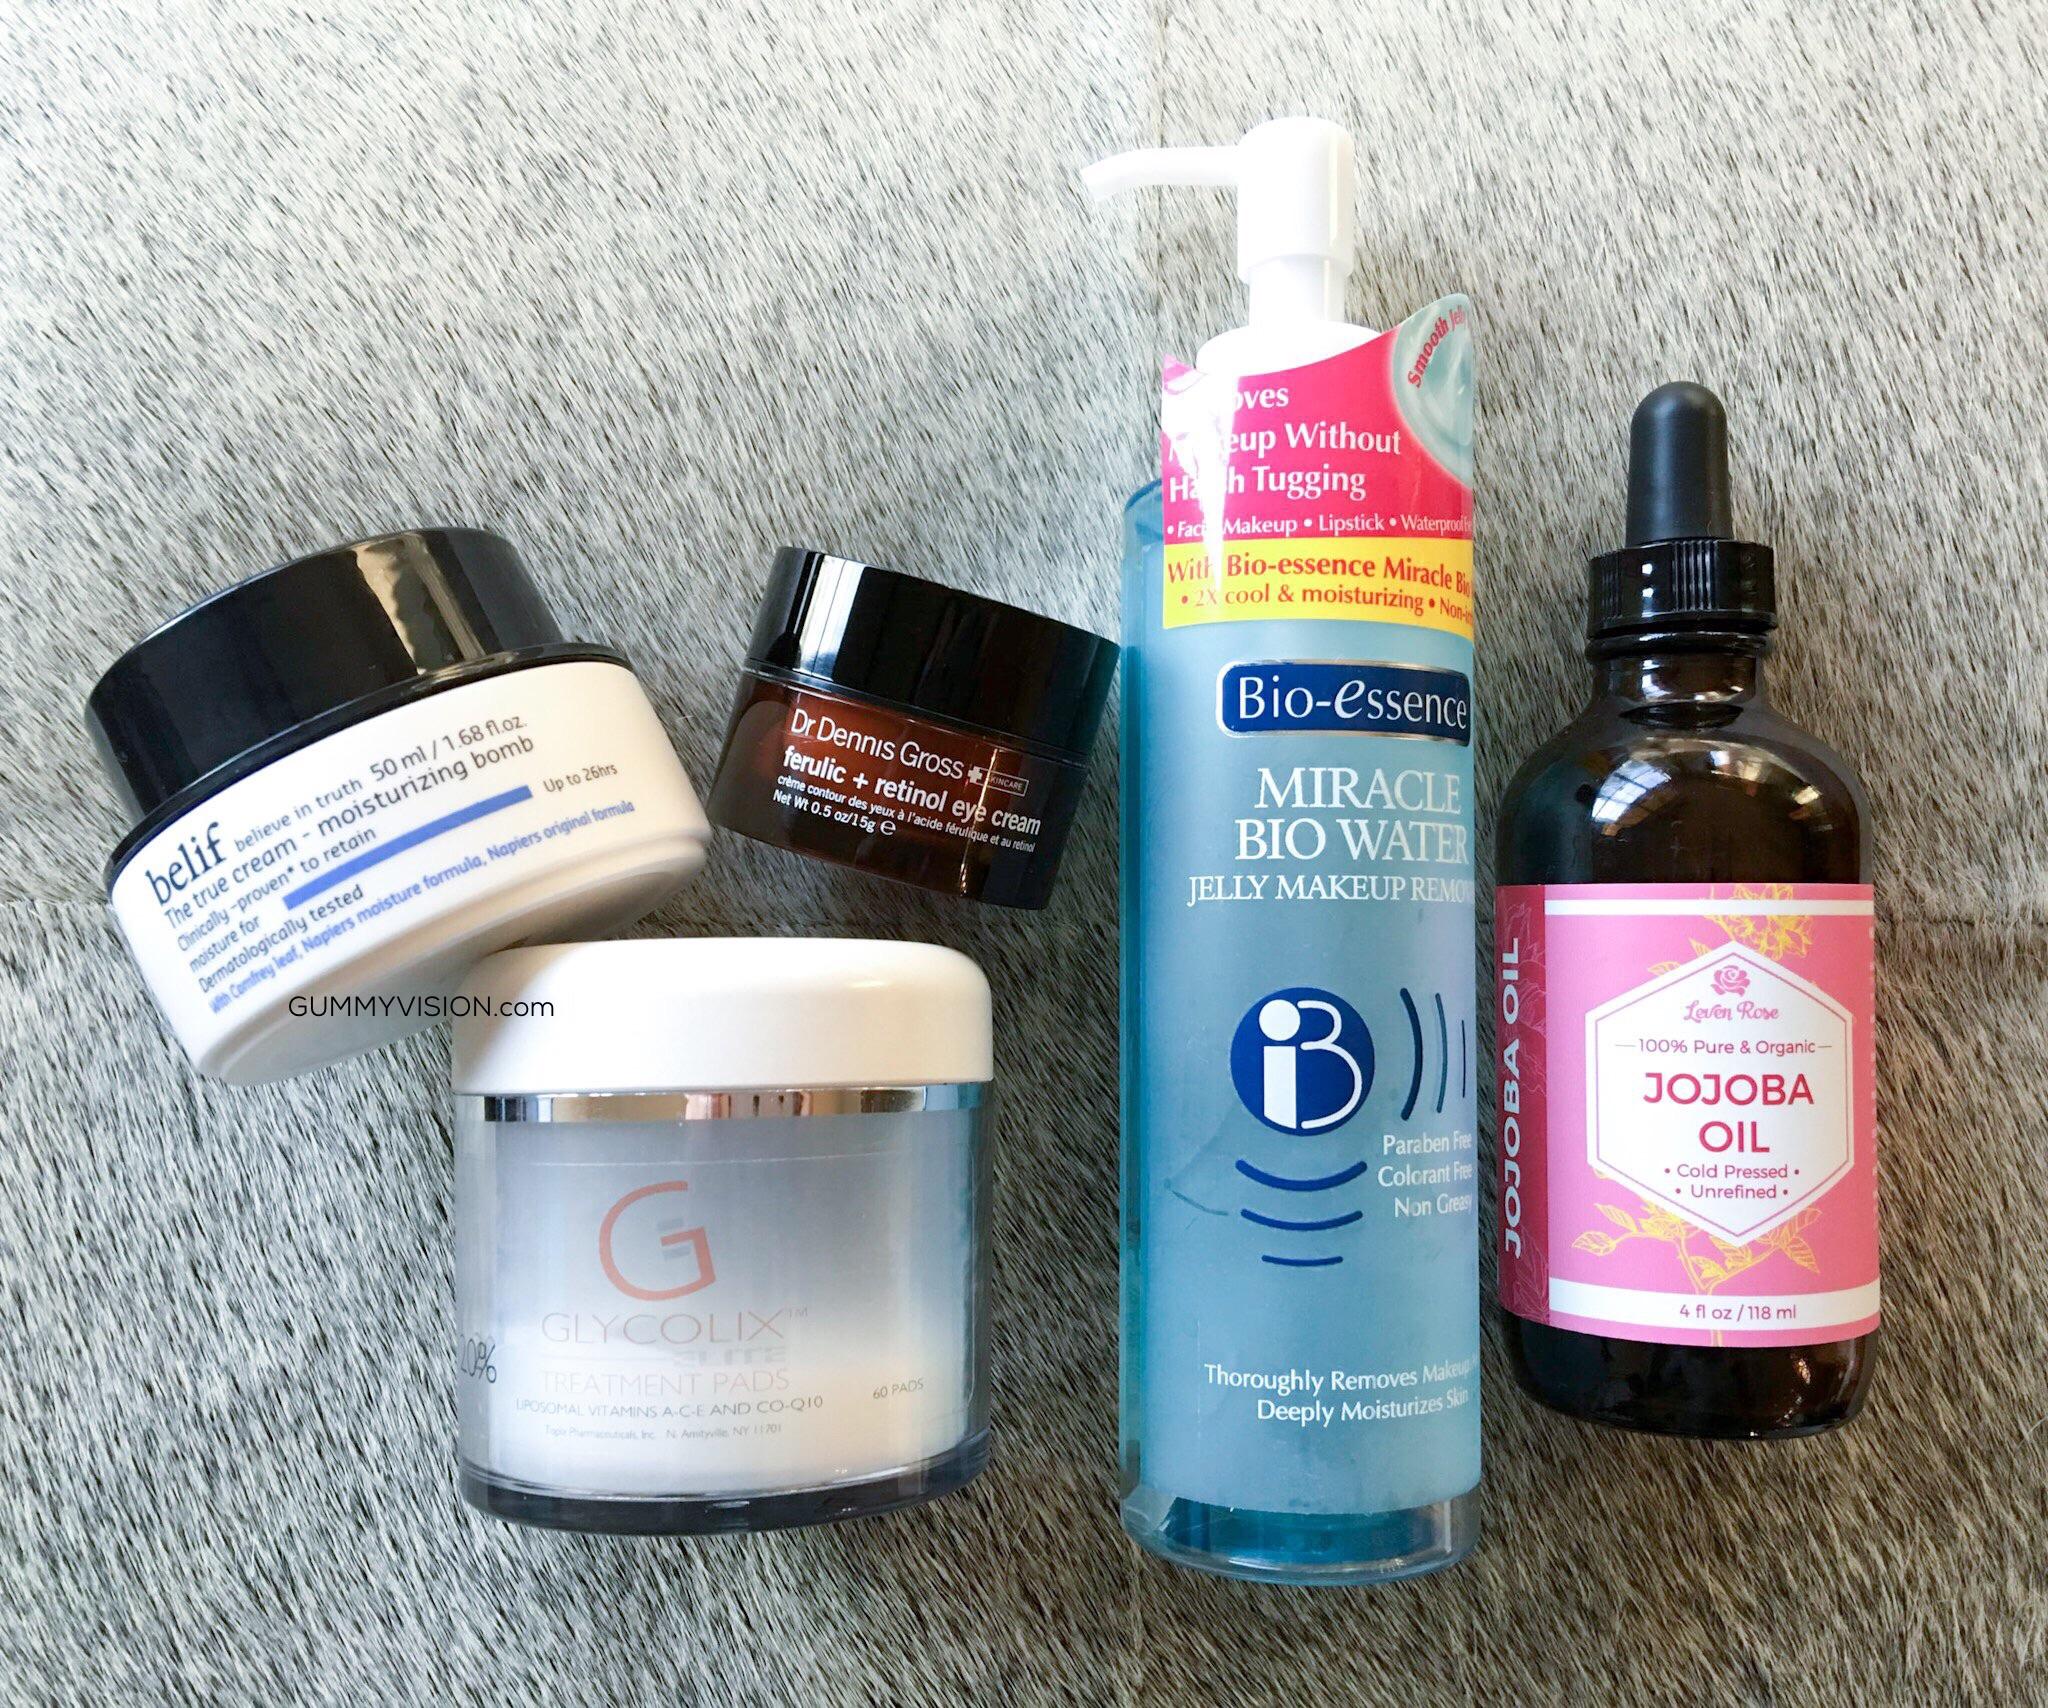 2015 Skincare Favorites - gummyvision.com